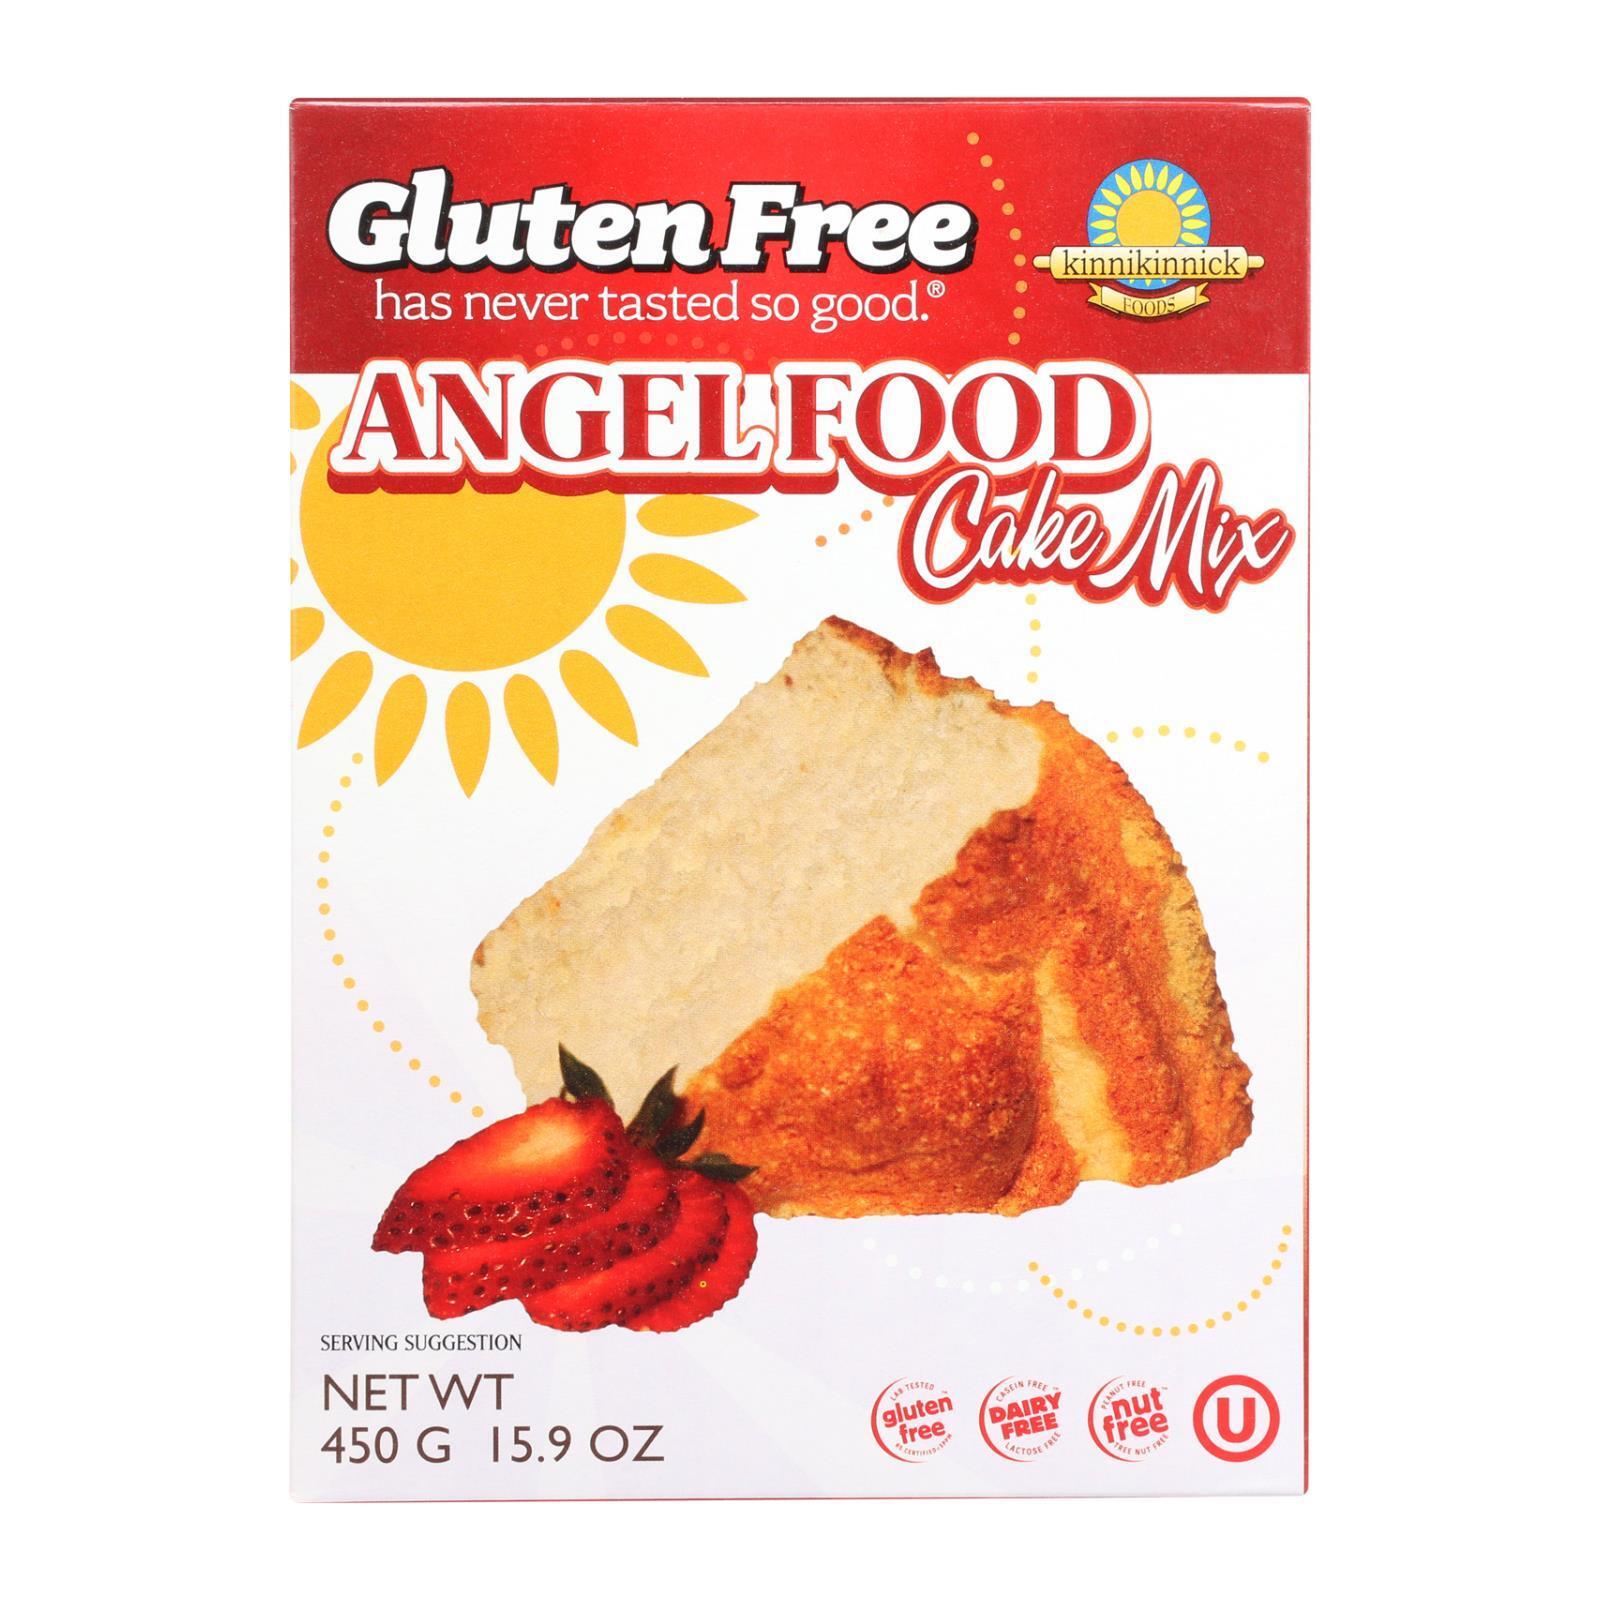 Kinnikinnick Angel Food Cake Mix - Case of 6 - 16 oz.